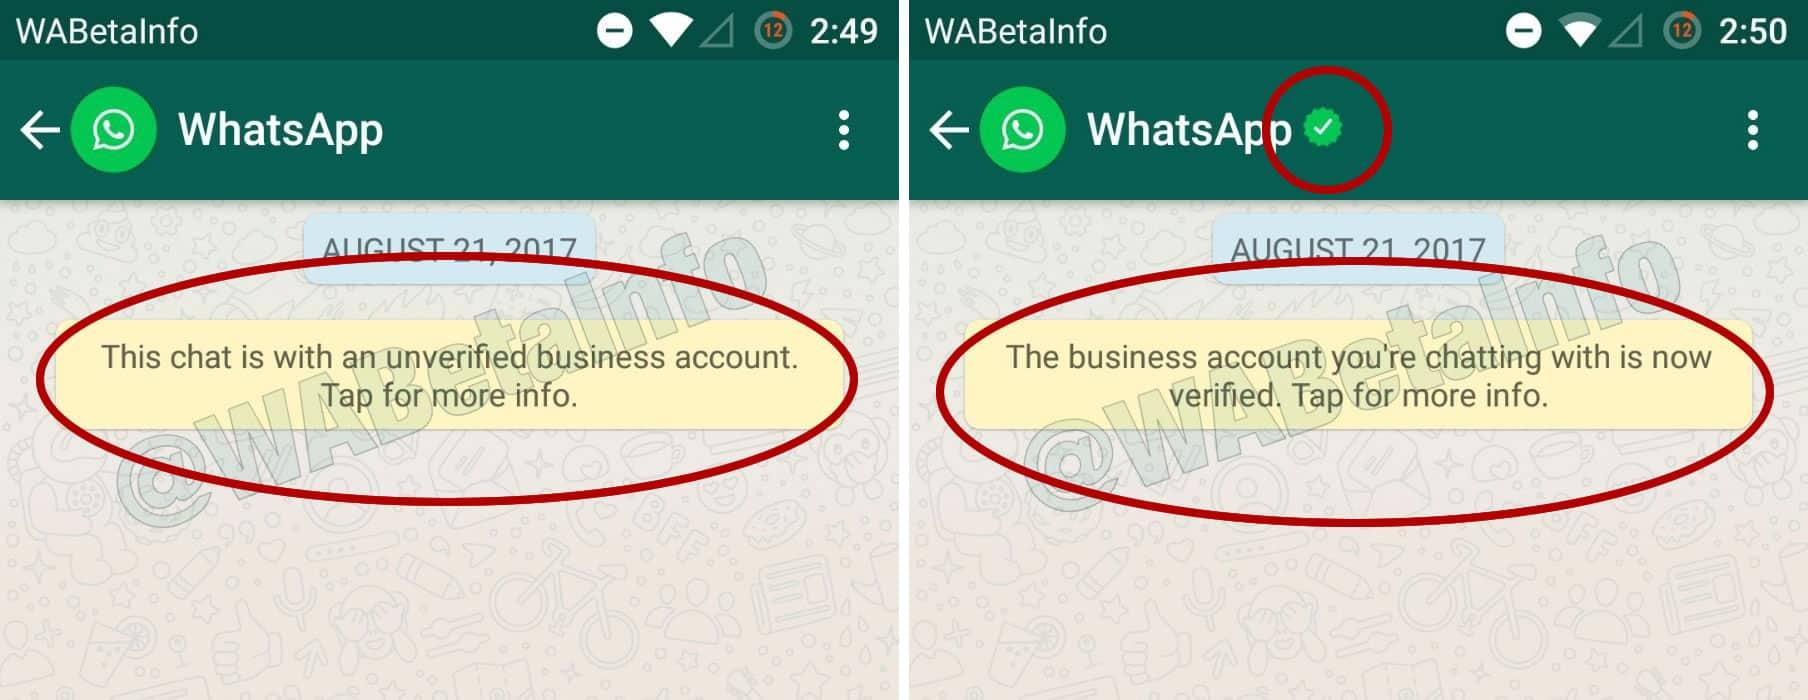 Existirán cuentas de empresas verificadas o no verificadas por WhatsApp.